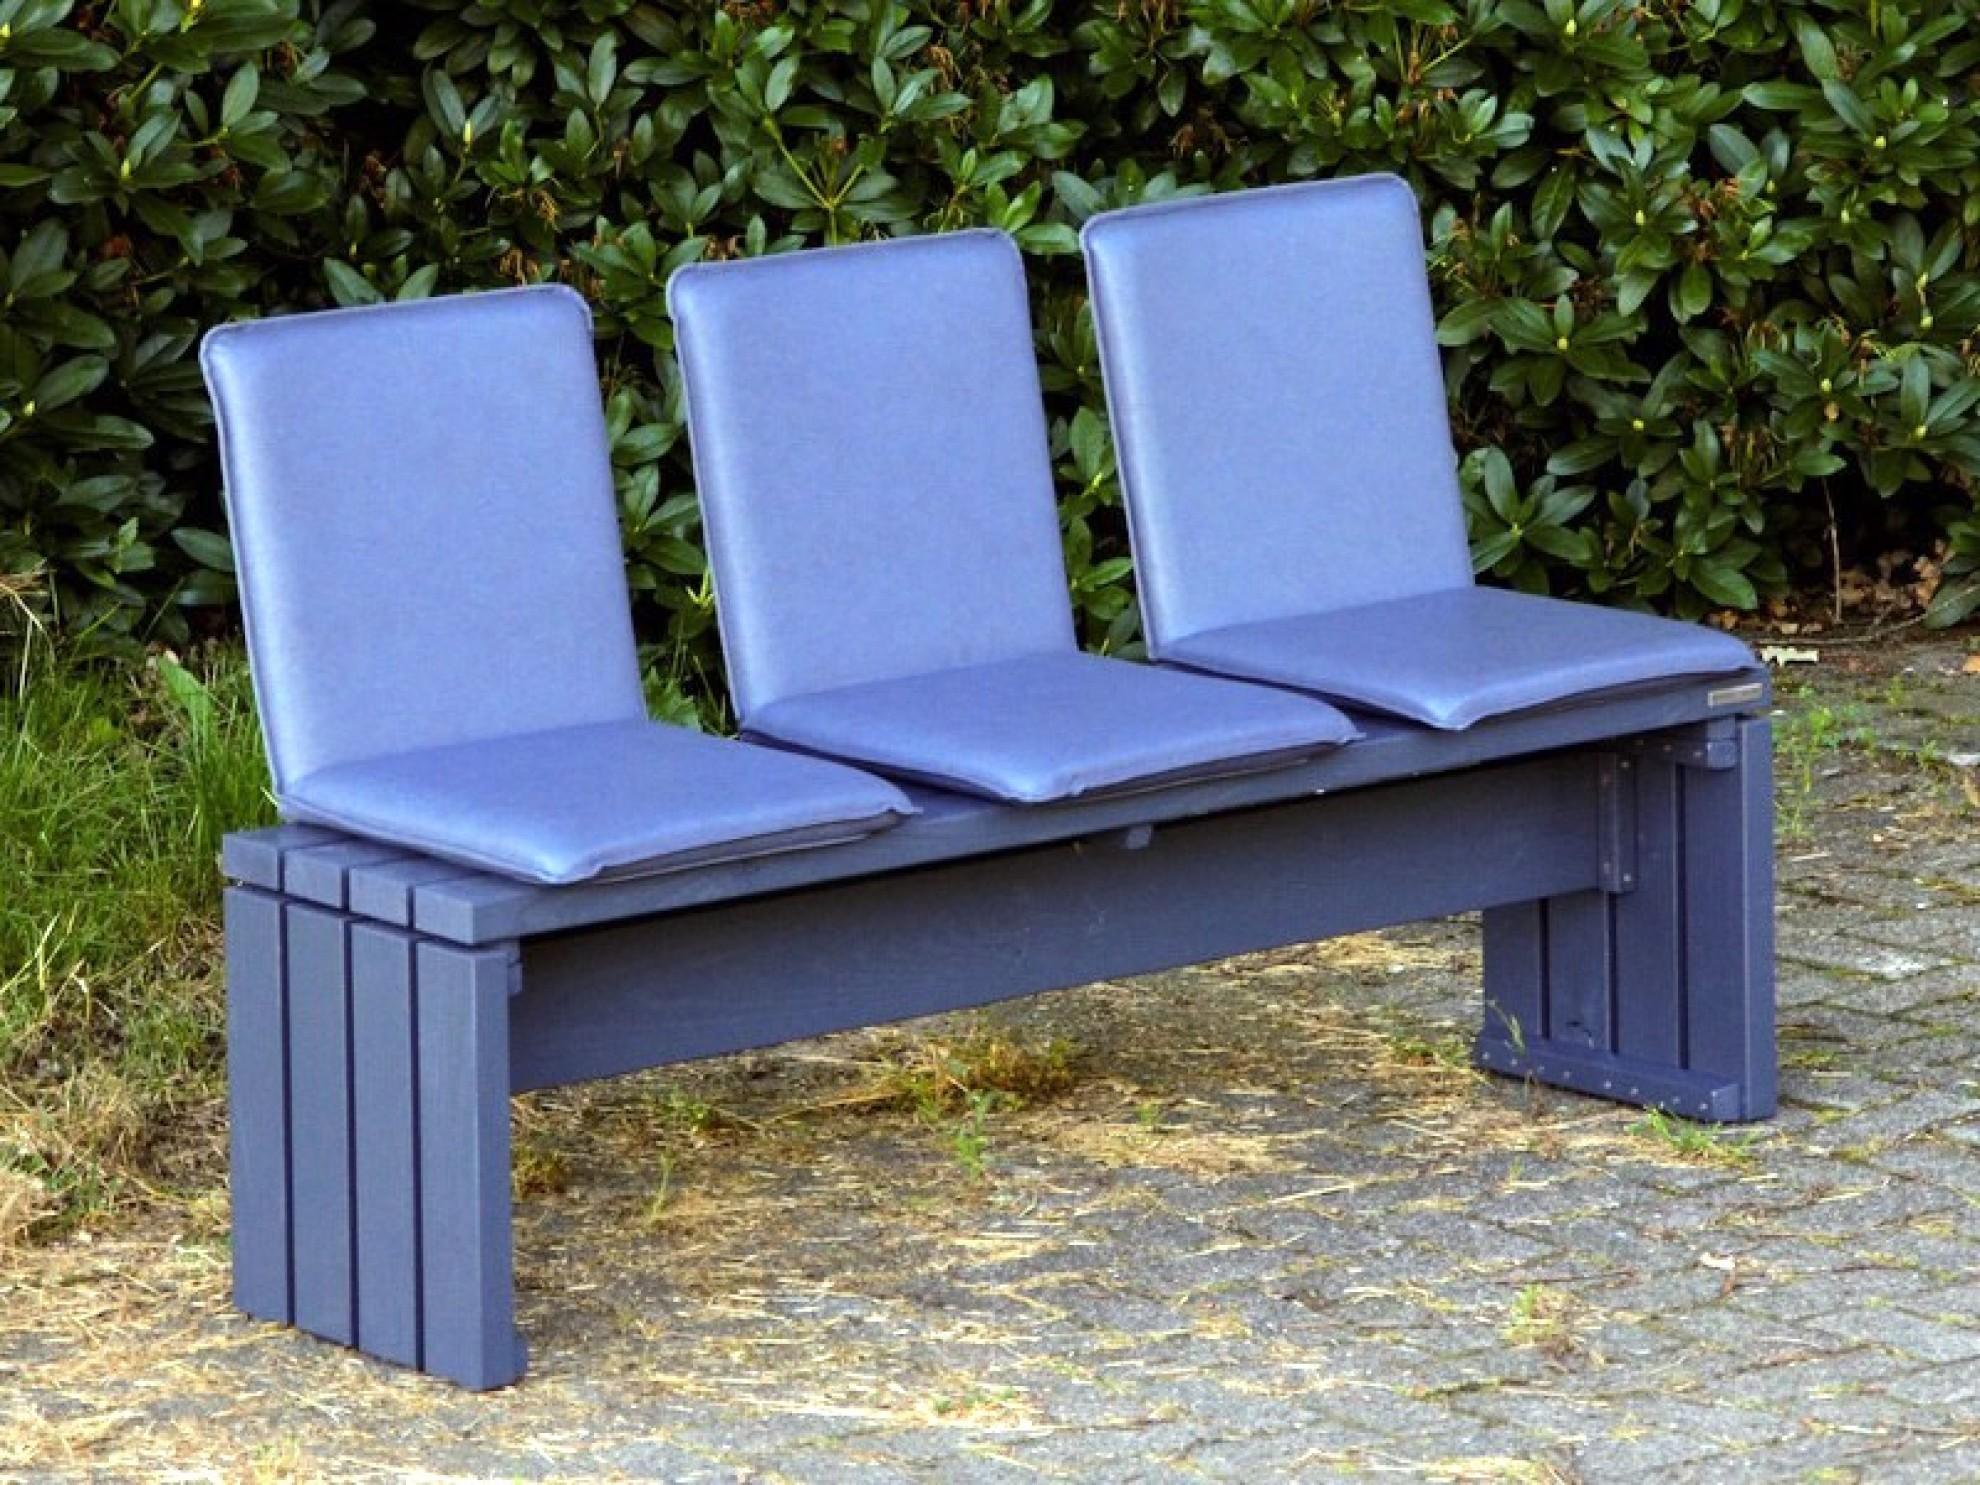 Gartenbank Holz. Great Rustikale Gartenbank Sitzer Aus Holz Massiv ...